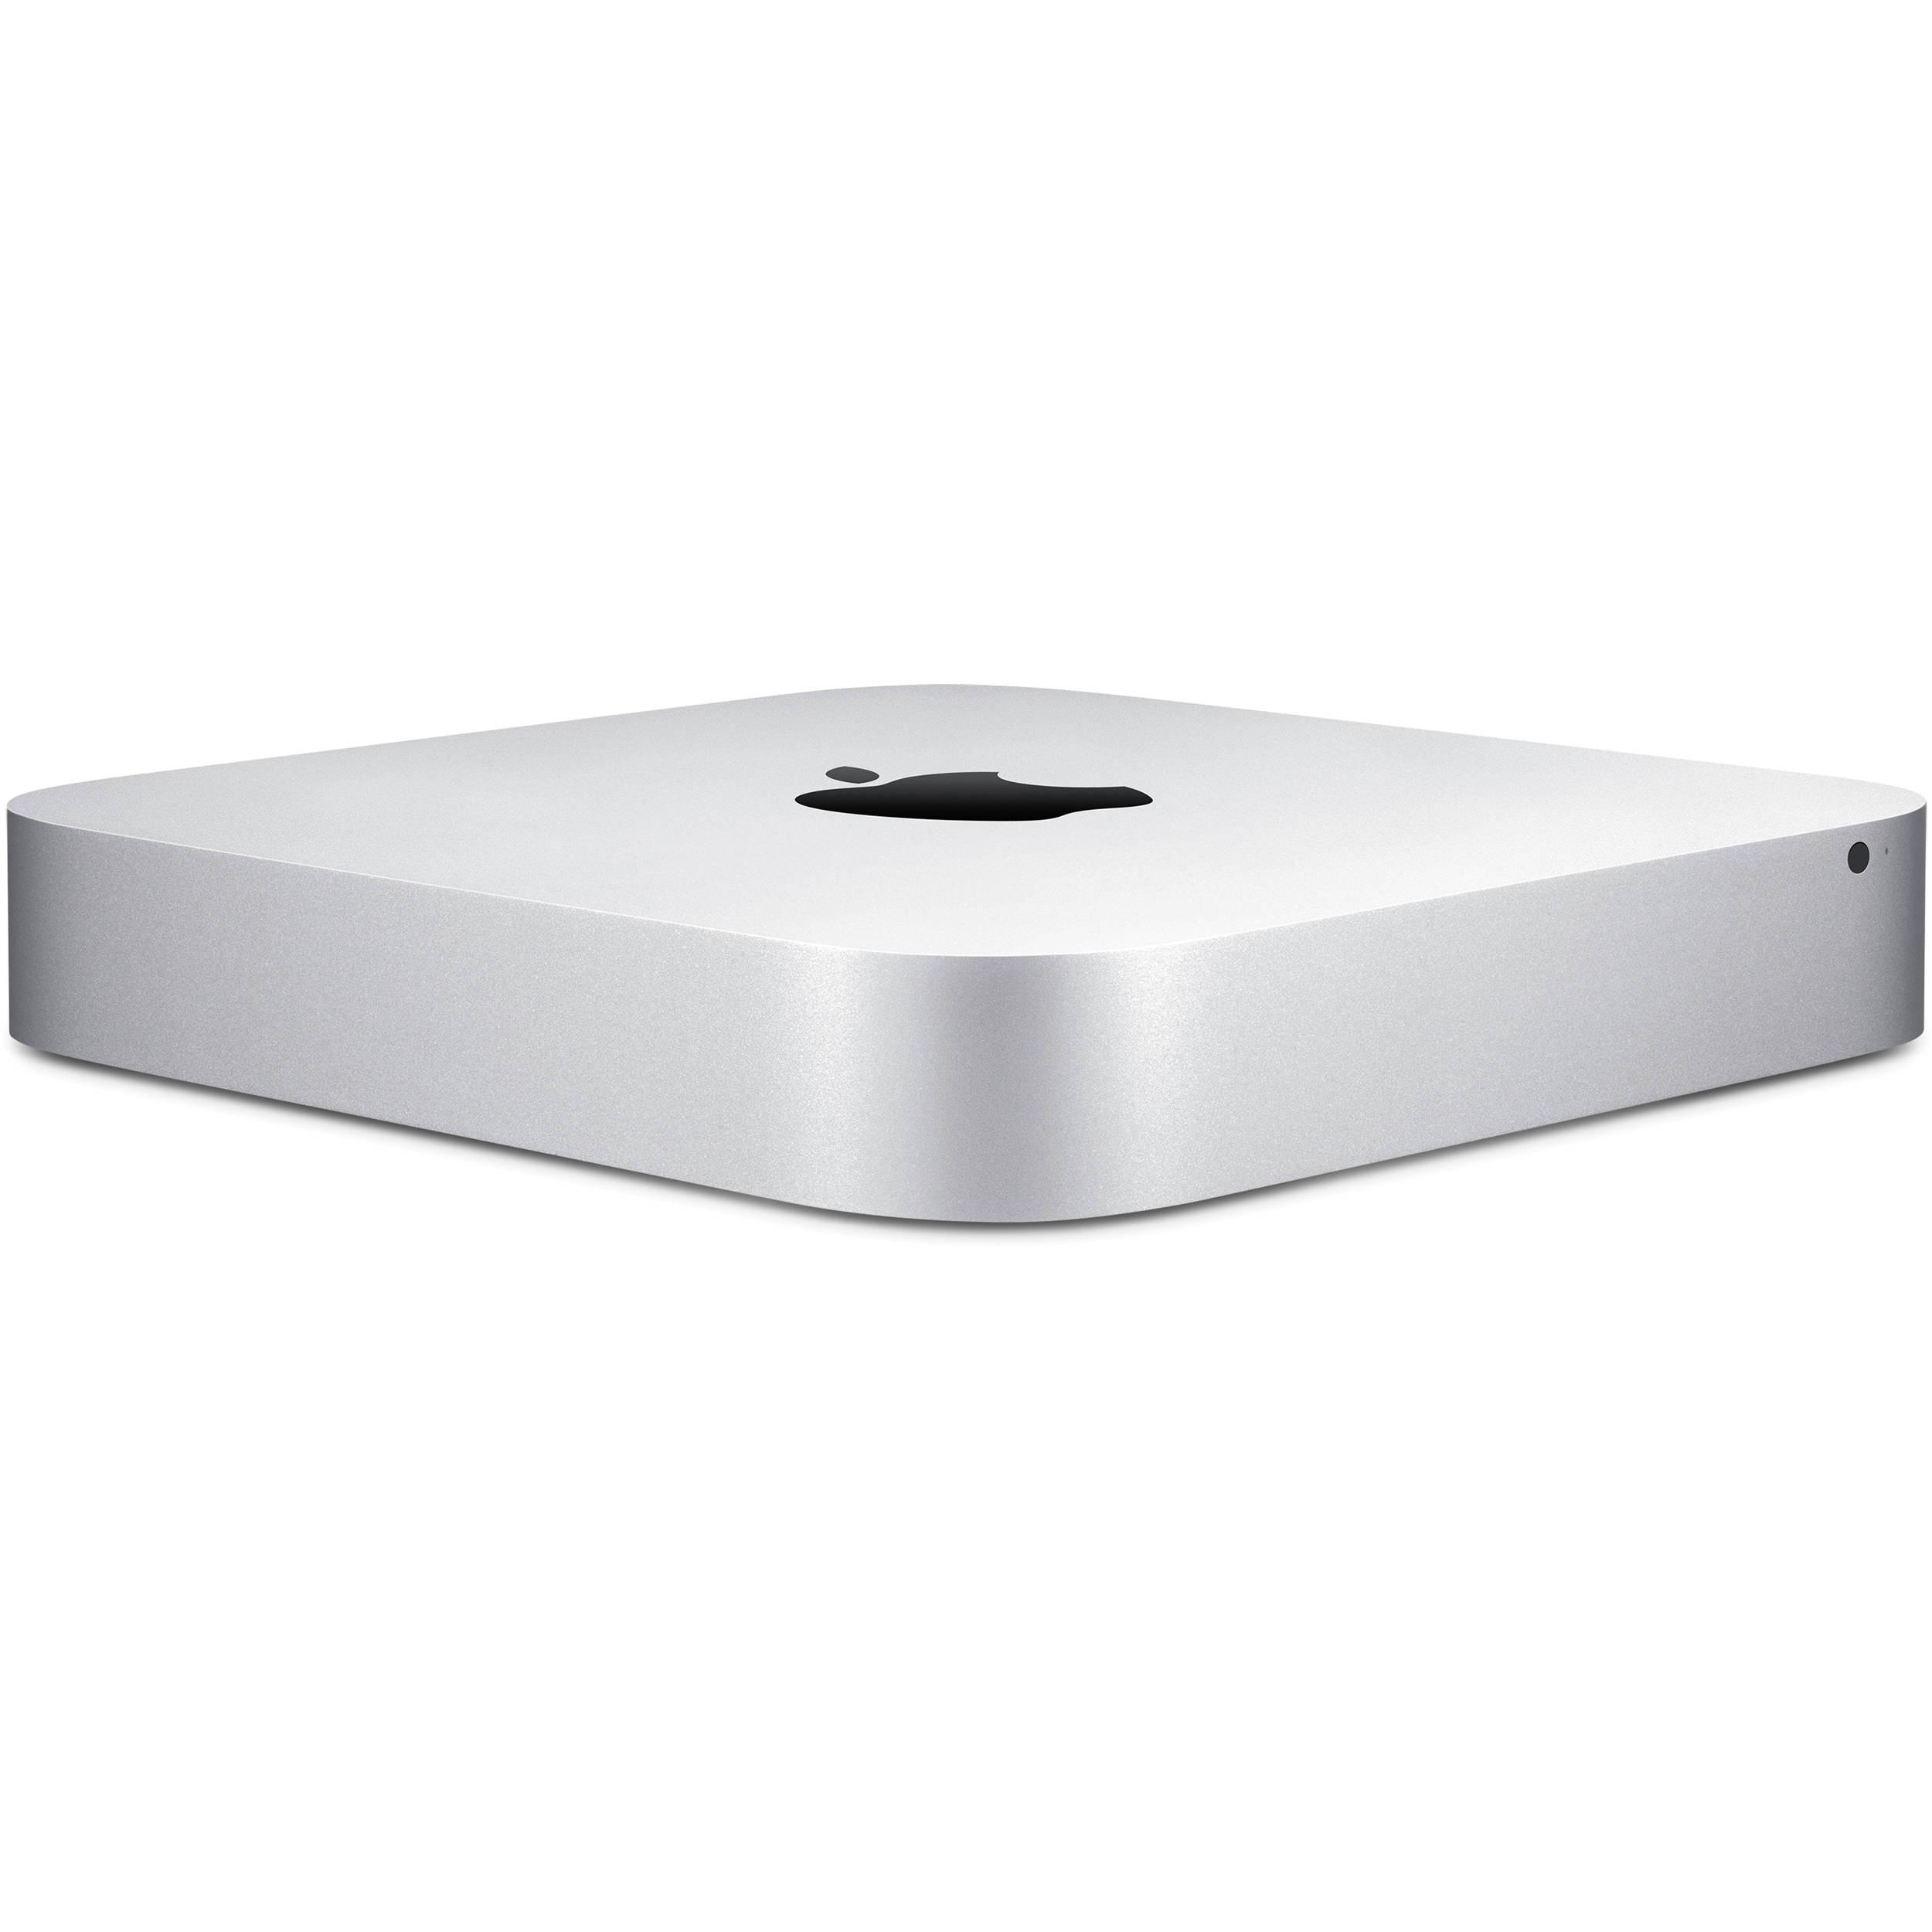 mac mini 2013 price india